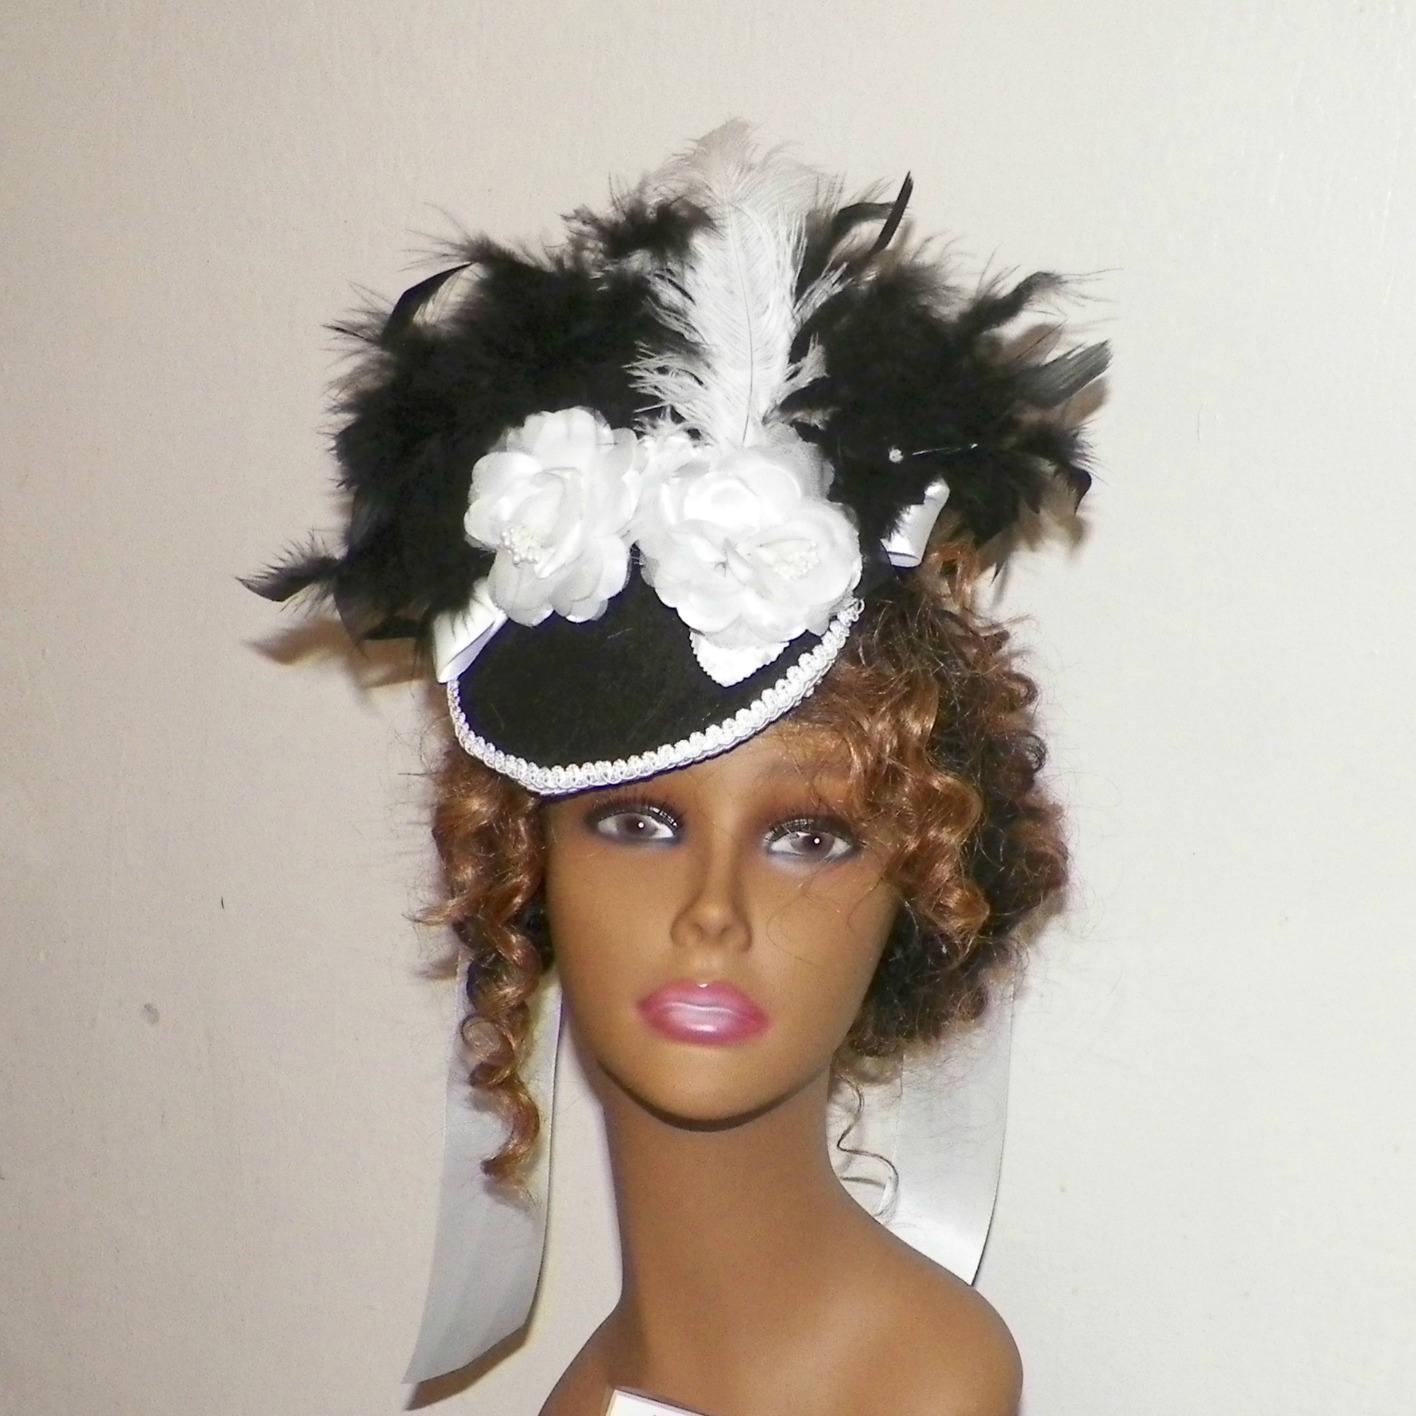 White,Black,Gothic,Fascinator,Victorian,Hat,Feather,Steampunk,Lolita,Costume,Headpiece,Old,West,Marie,Antoinette,Accessories,womans_hat,victorian_hat,Marie_Antoinette,gothic_hat,gothic_headdress,gothic_headpiece,lolita_hat,black_fascinator,gothic_fascinator,steampunk_hat,feather_headdress,white_fascinator,white_hat